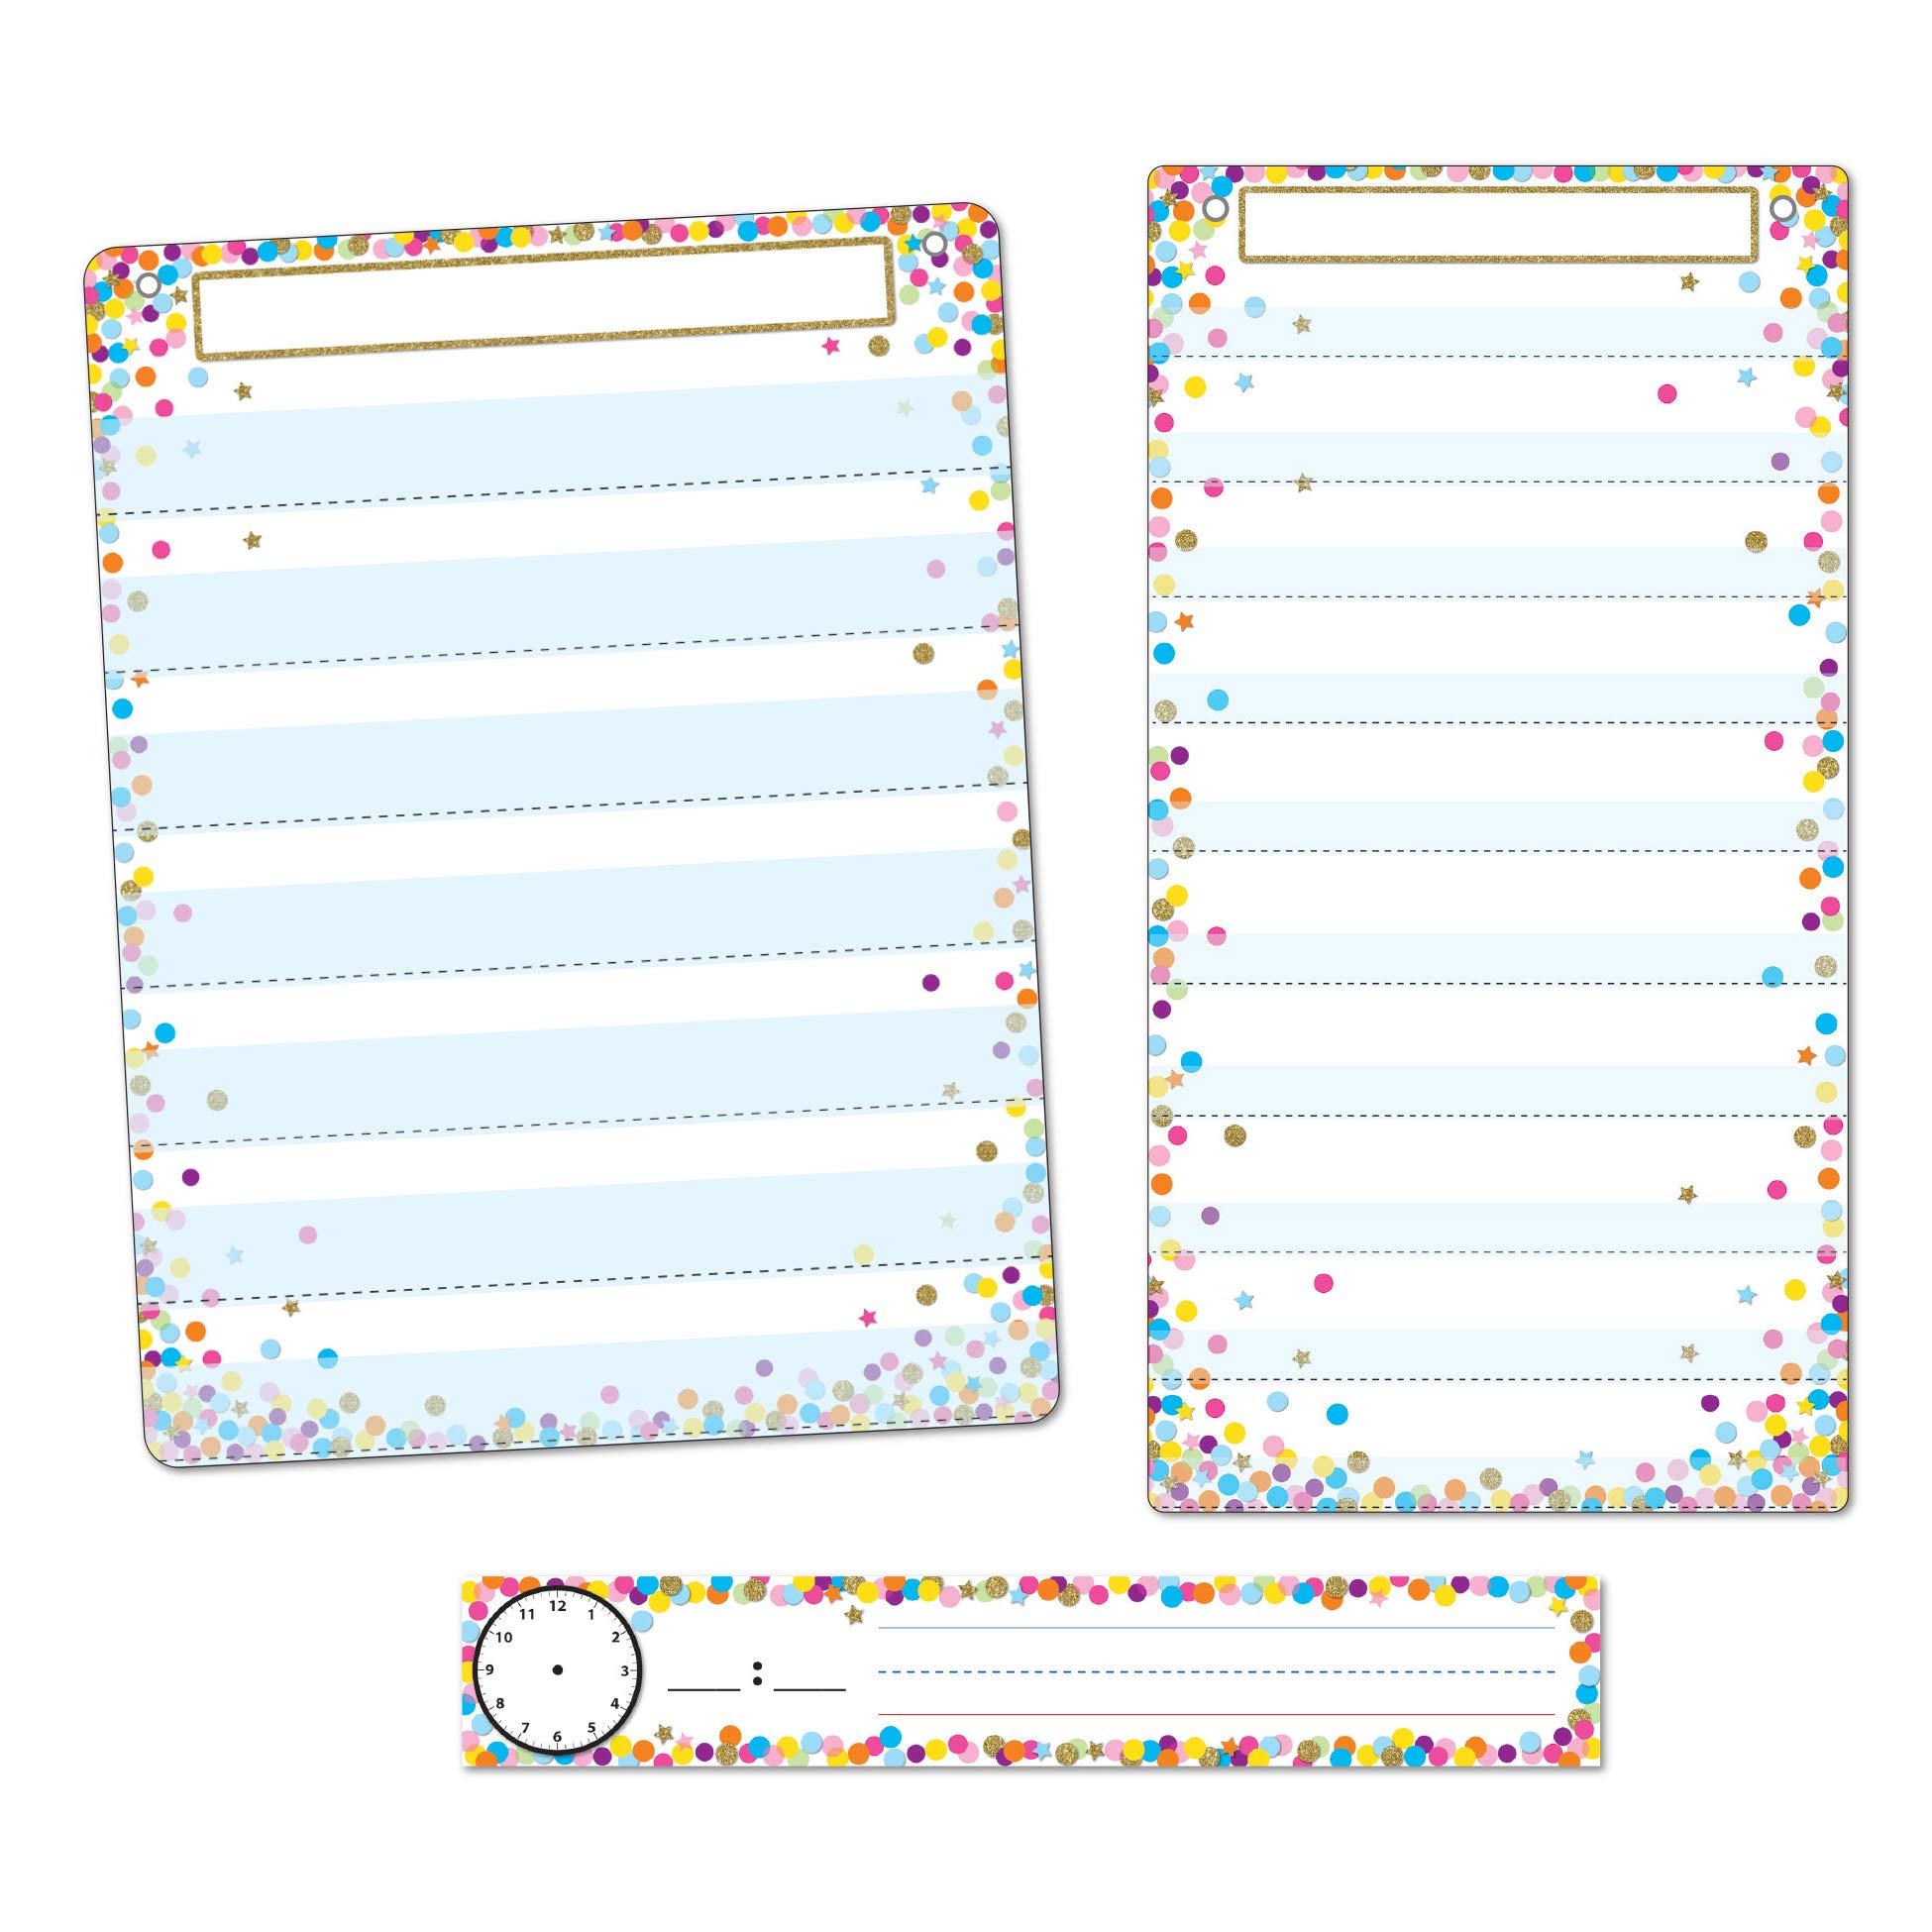 Ashley Productions ASH94500 Smart Poly Confetti 3-Piece Pocket Chart Set, Polypropylene (PP),